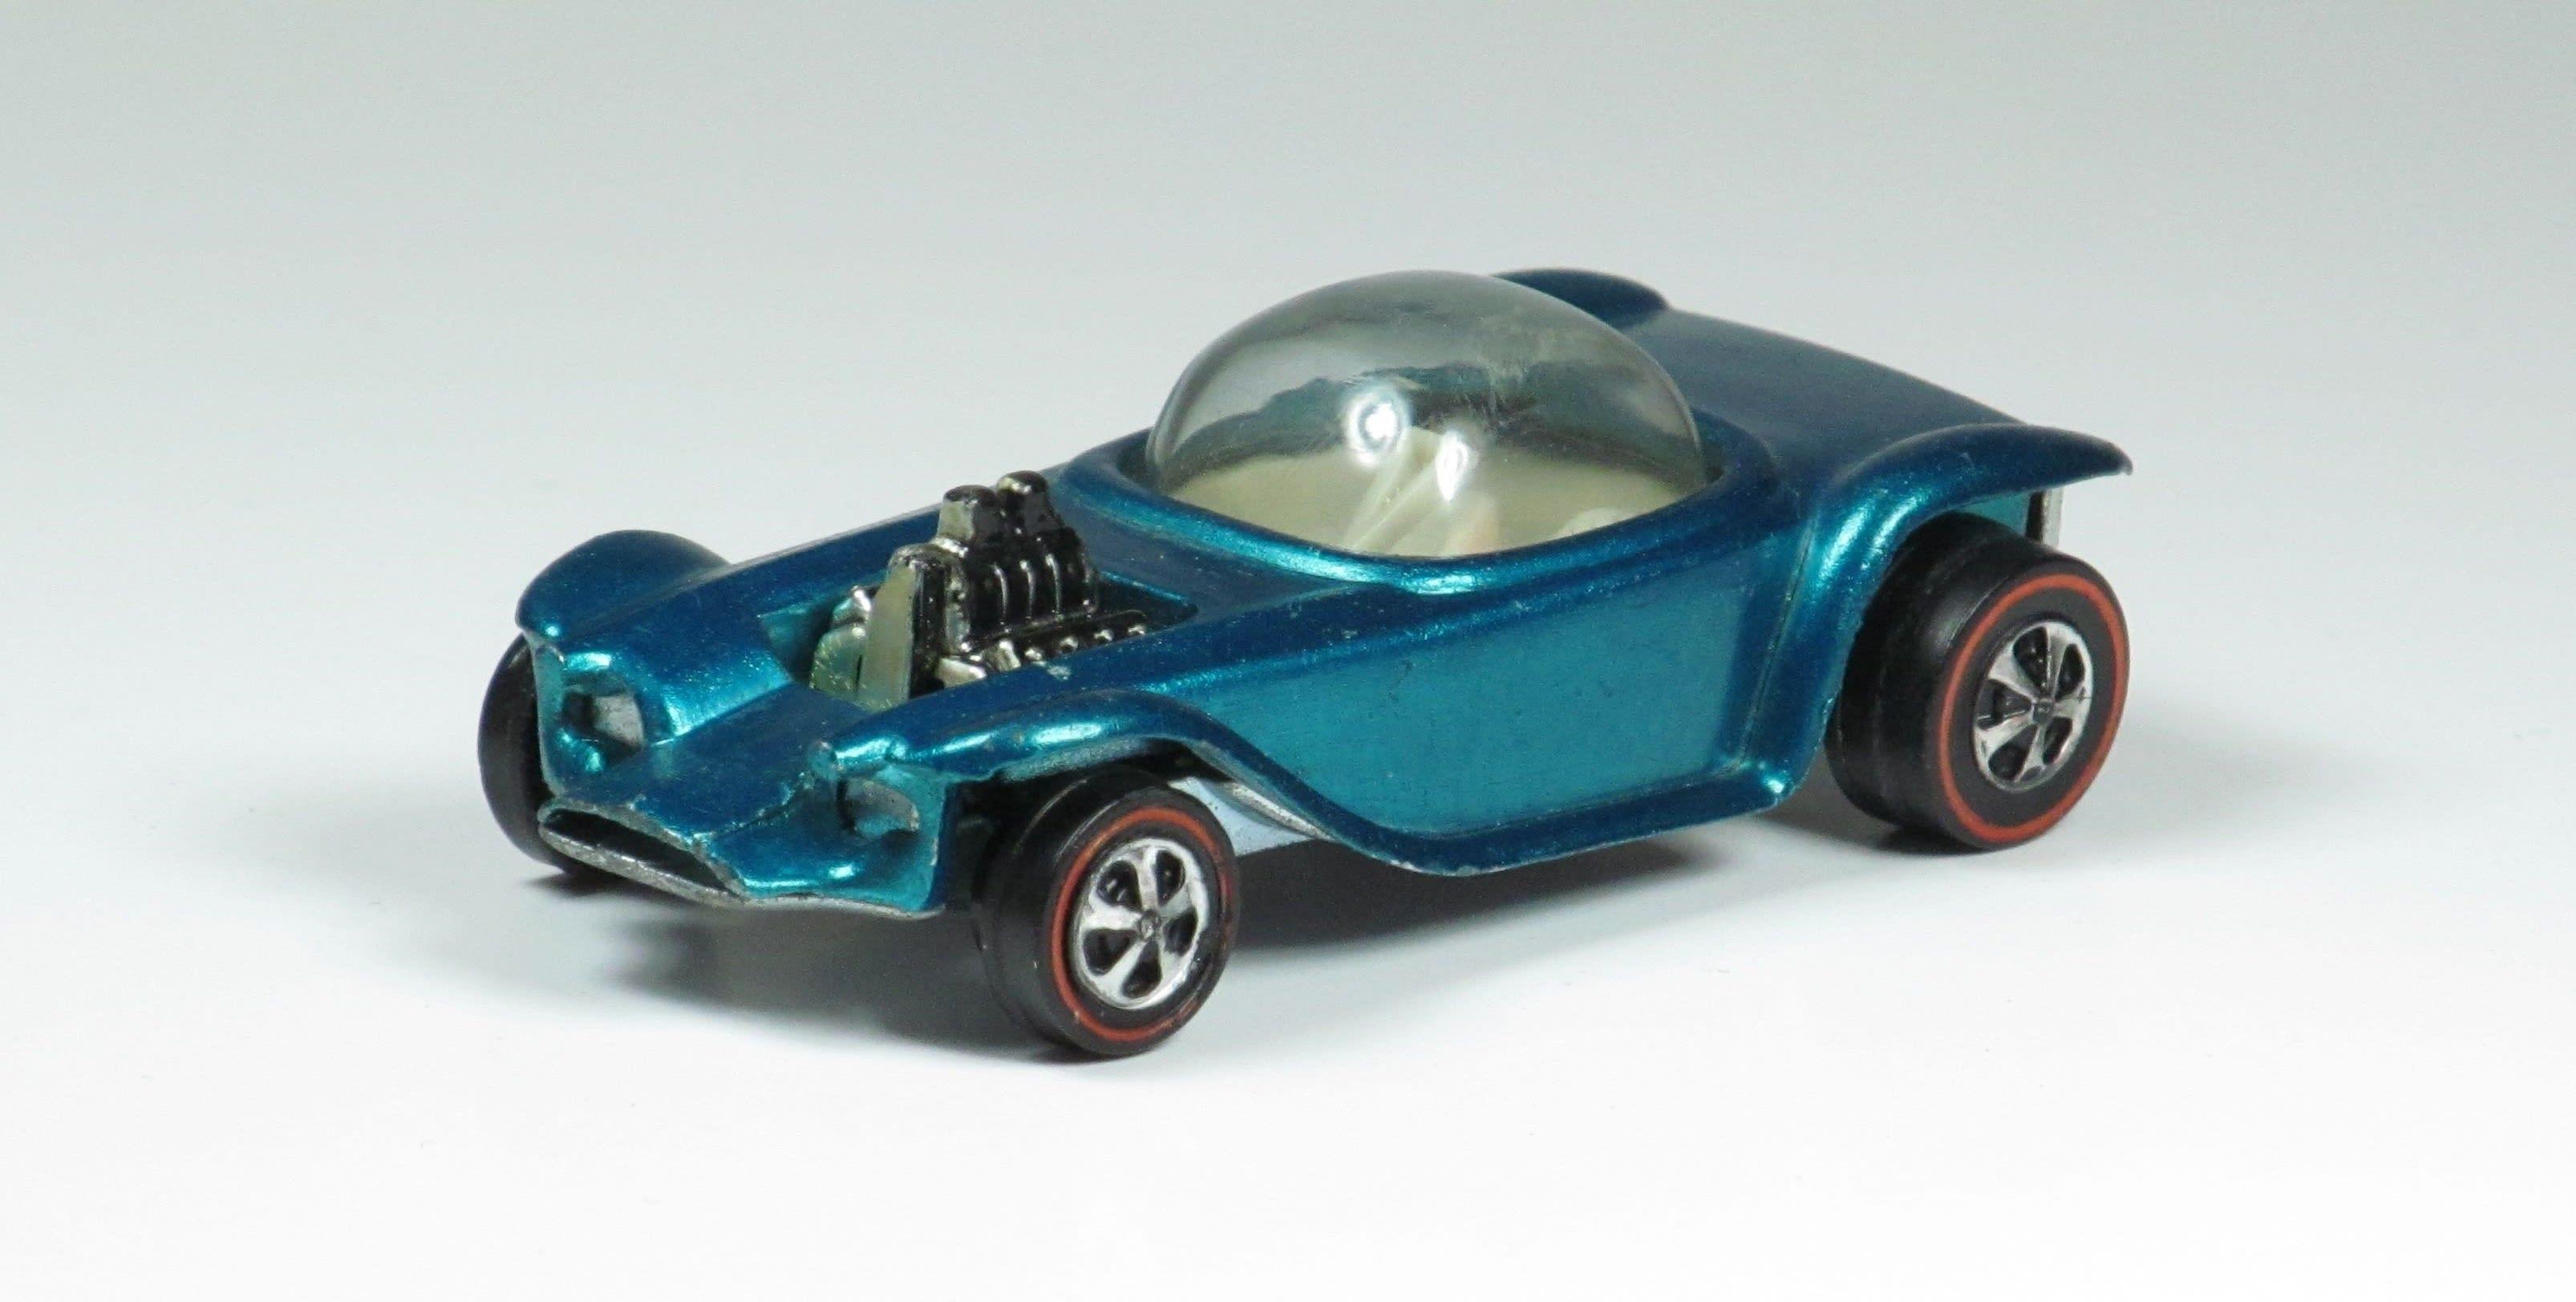 https://thumbs.worthpoint.com/zoom/images1/1/1217/31/1968-hot-wheels-beatnik-bandit-ed_1_b43943da3fe